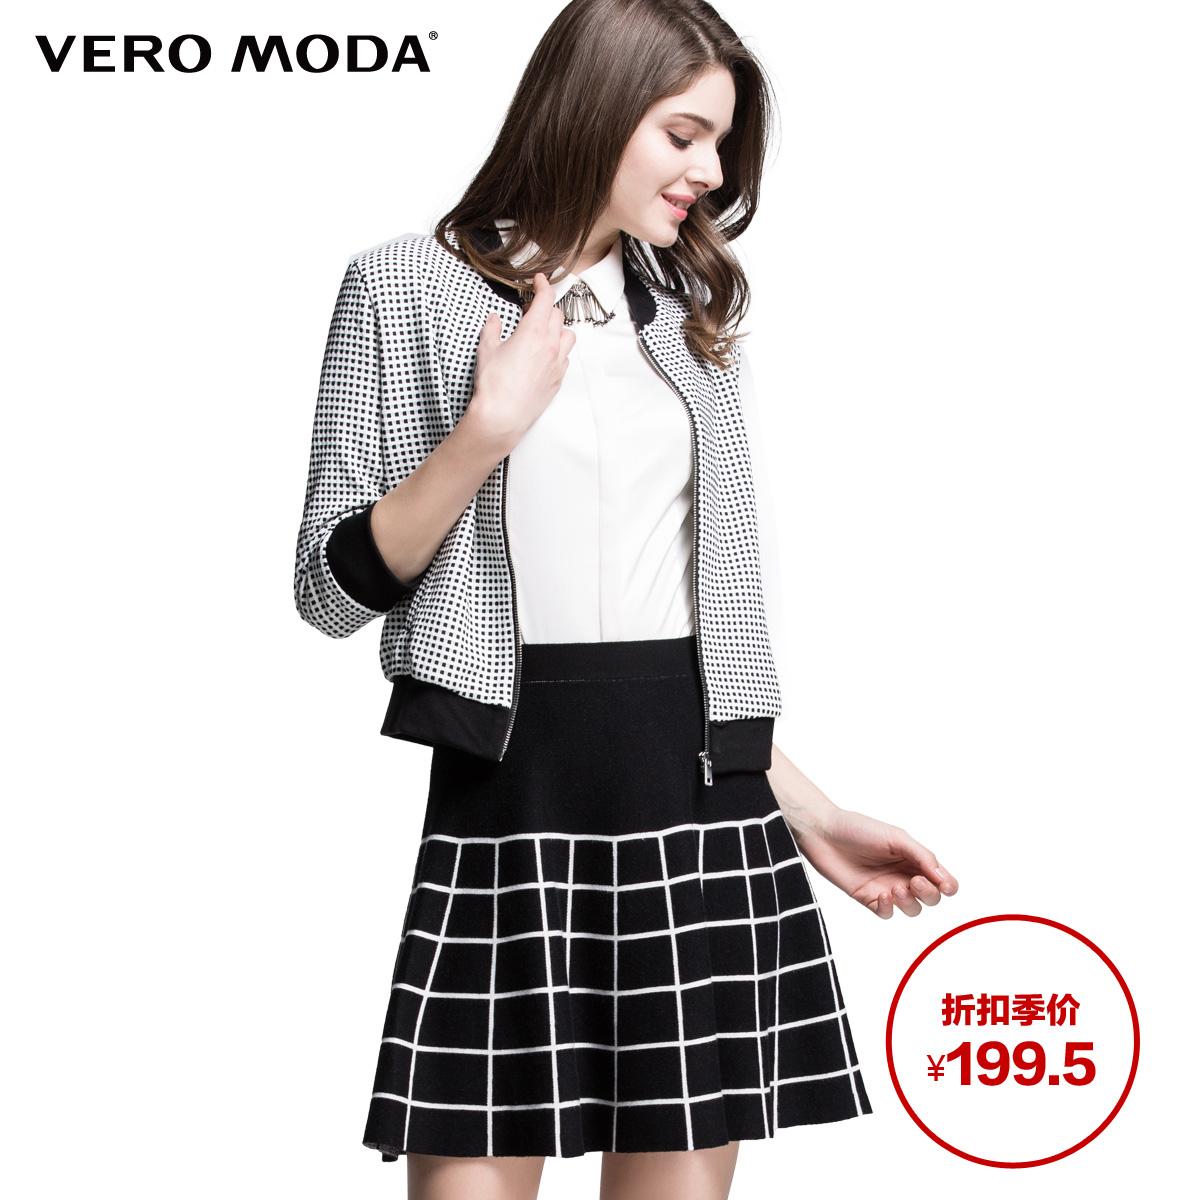 Короткая куртка VERO MODA 315133010 199.5 daybreak hardlex uhren 2015 damske hodinky orologi di moda relojes relogios db2161